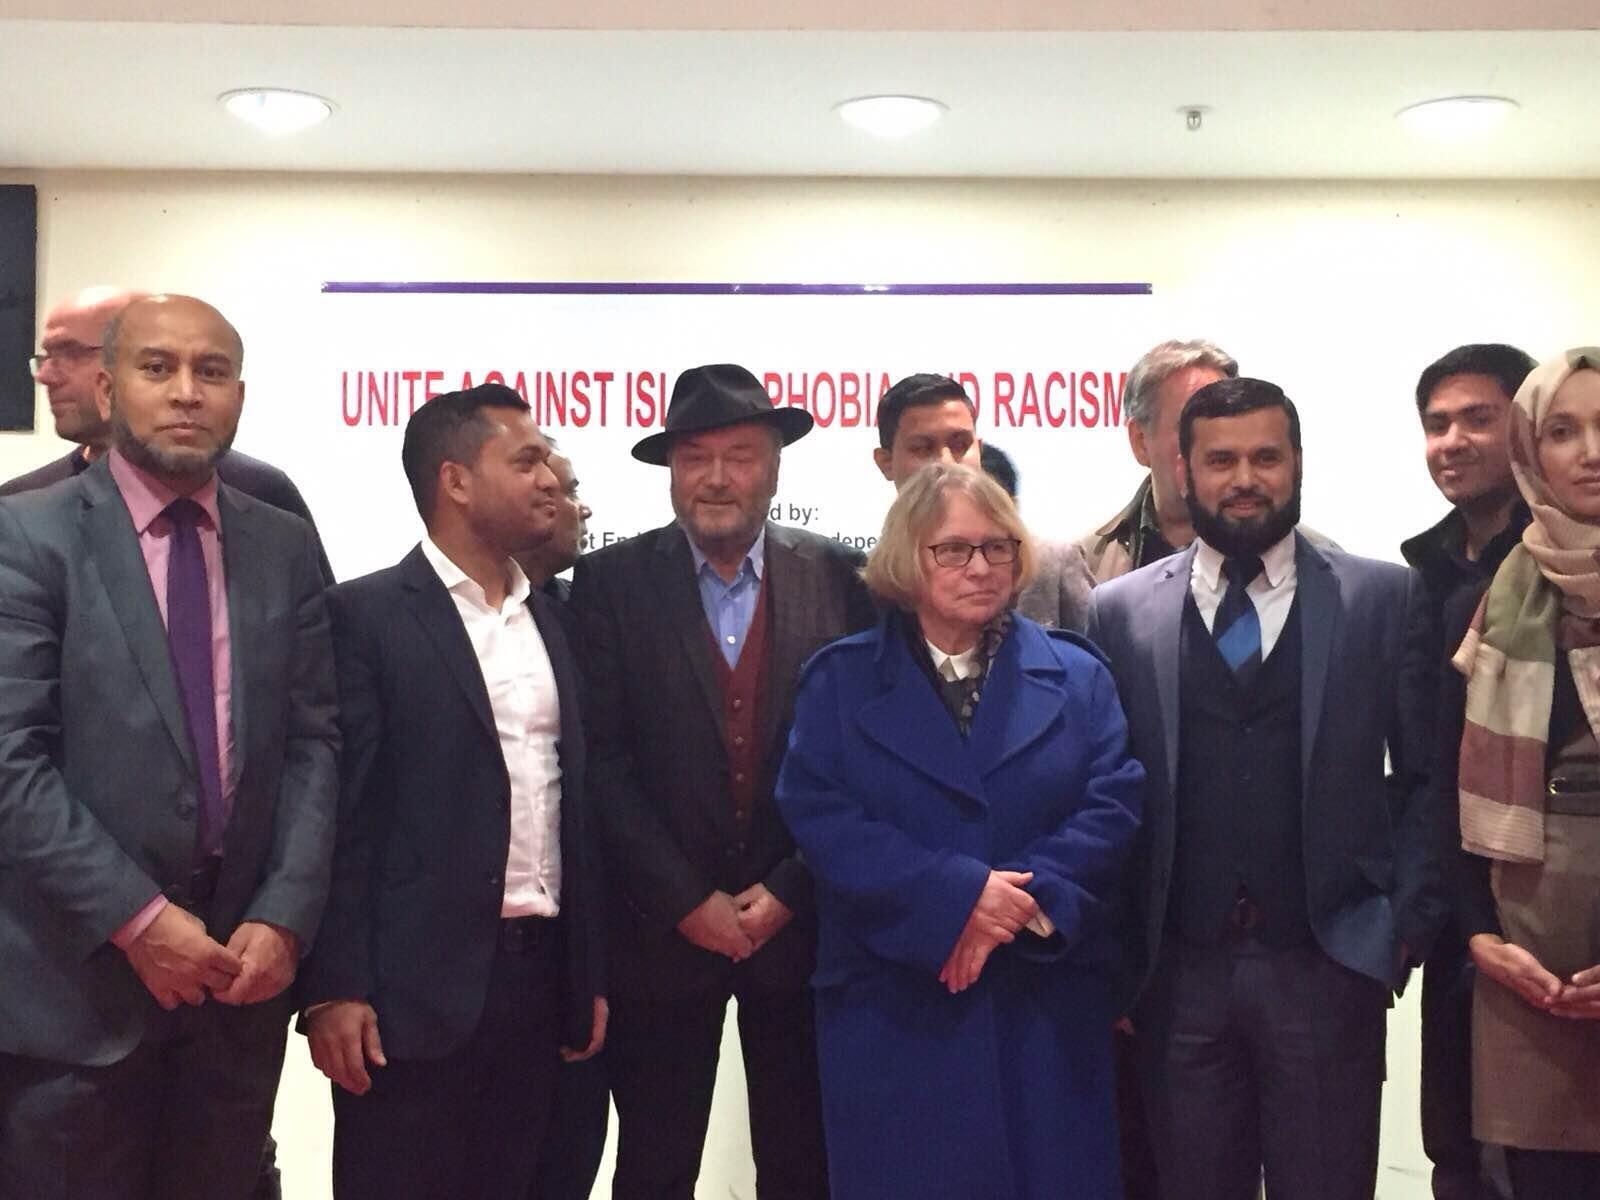 Unite against Islamophobia and Fascism